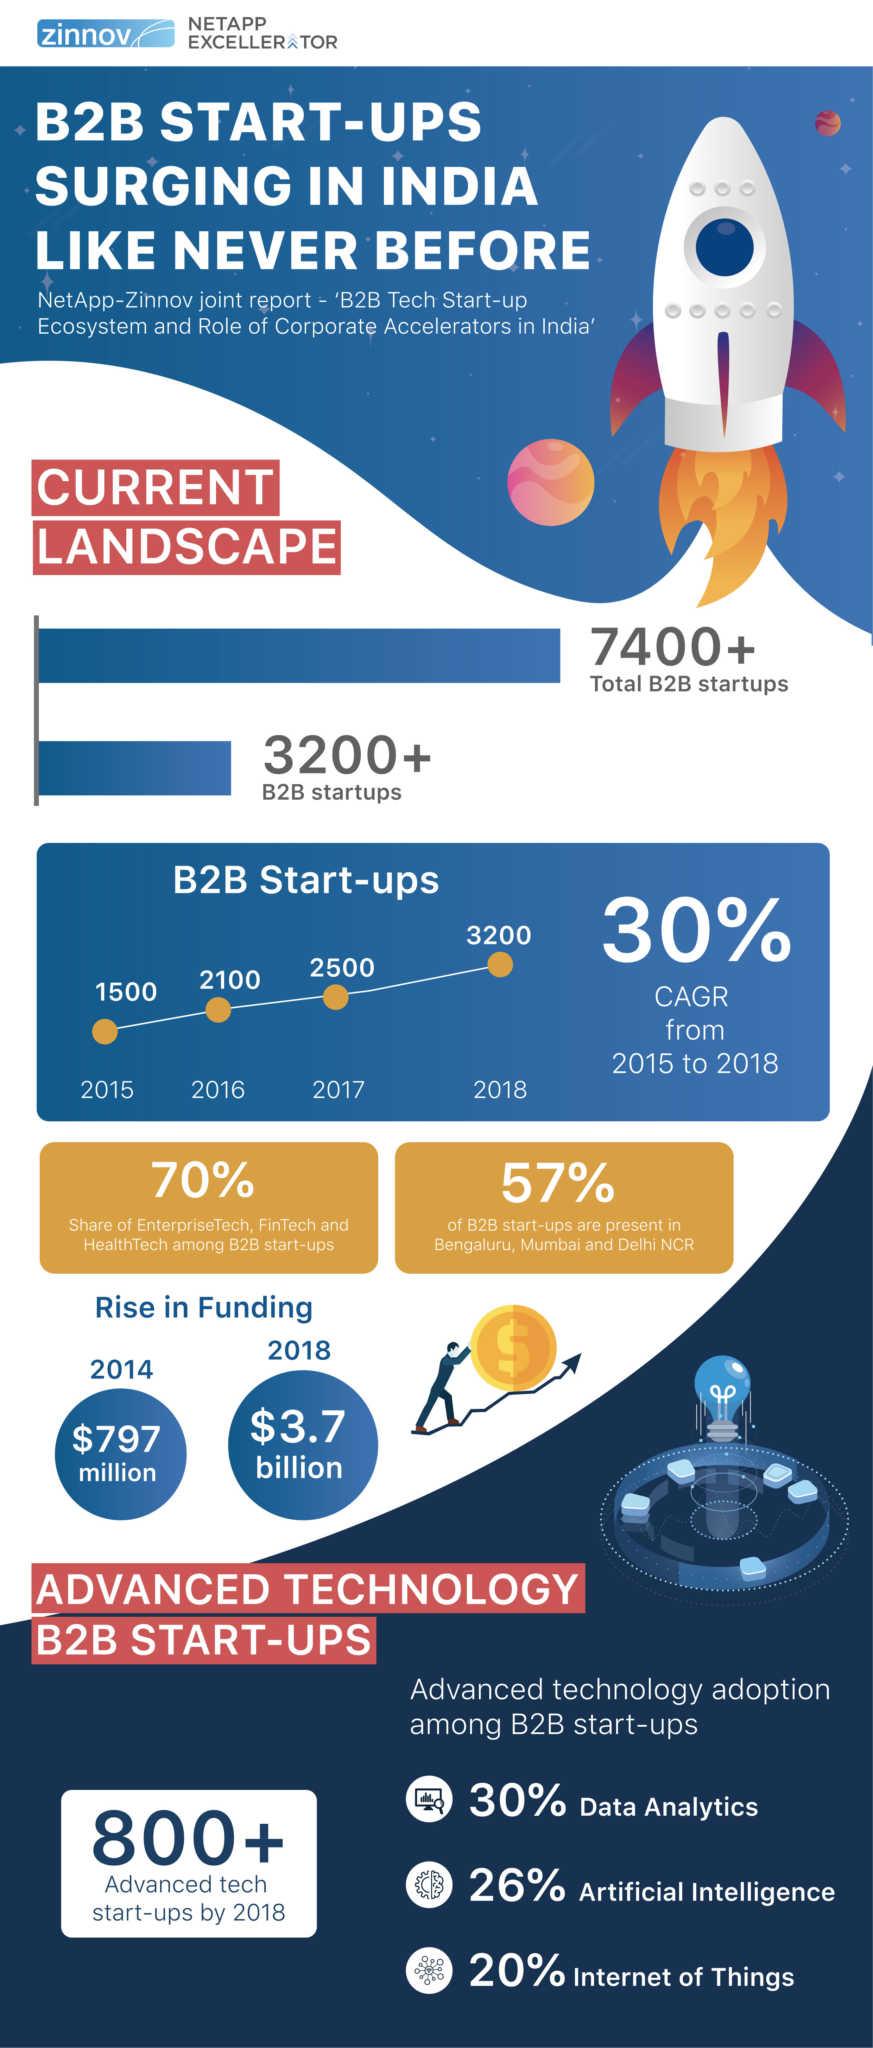 NetApp – Zinnov B2B Tech Startup Study _ Infographic 1